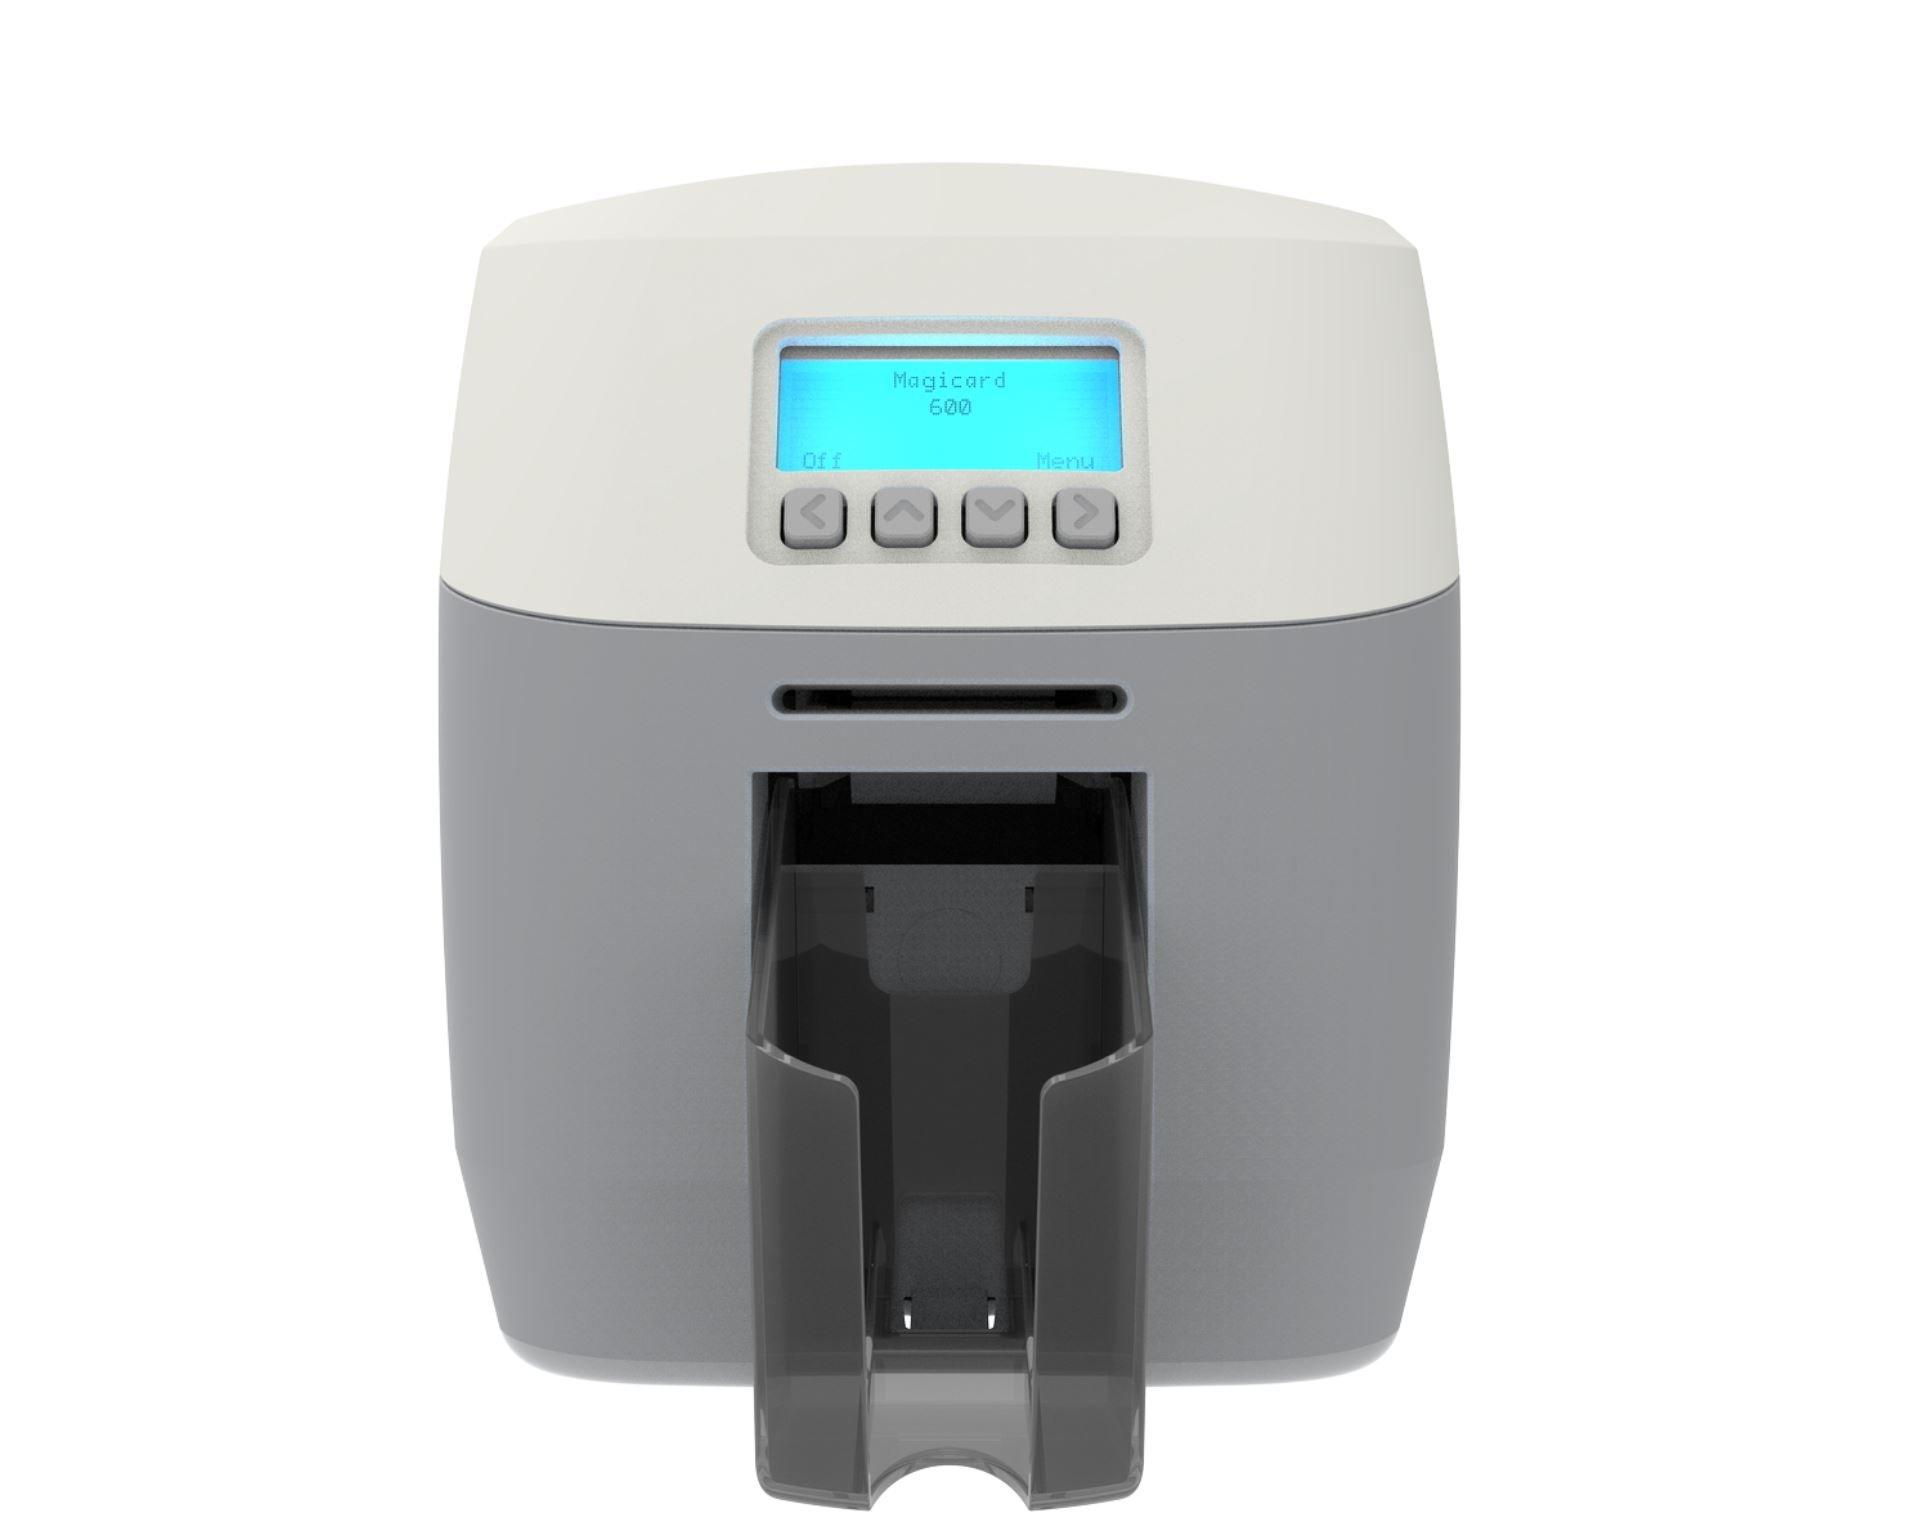 Magicard_600_ID_Card_Printer_with_Smart_Card_Encoding_3652-5003